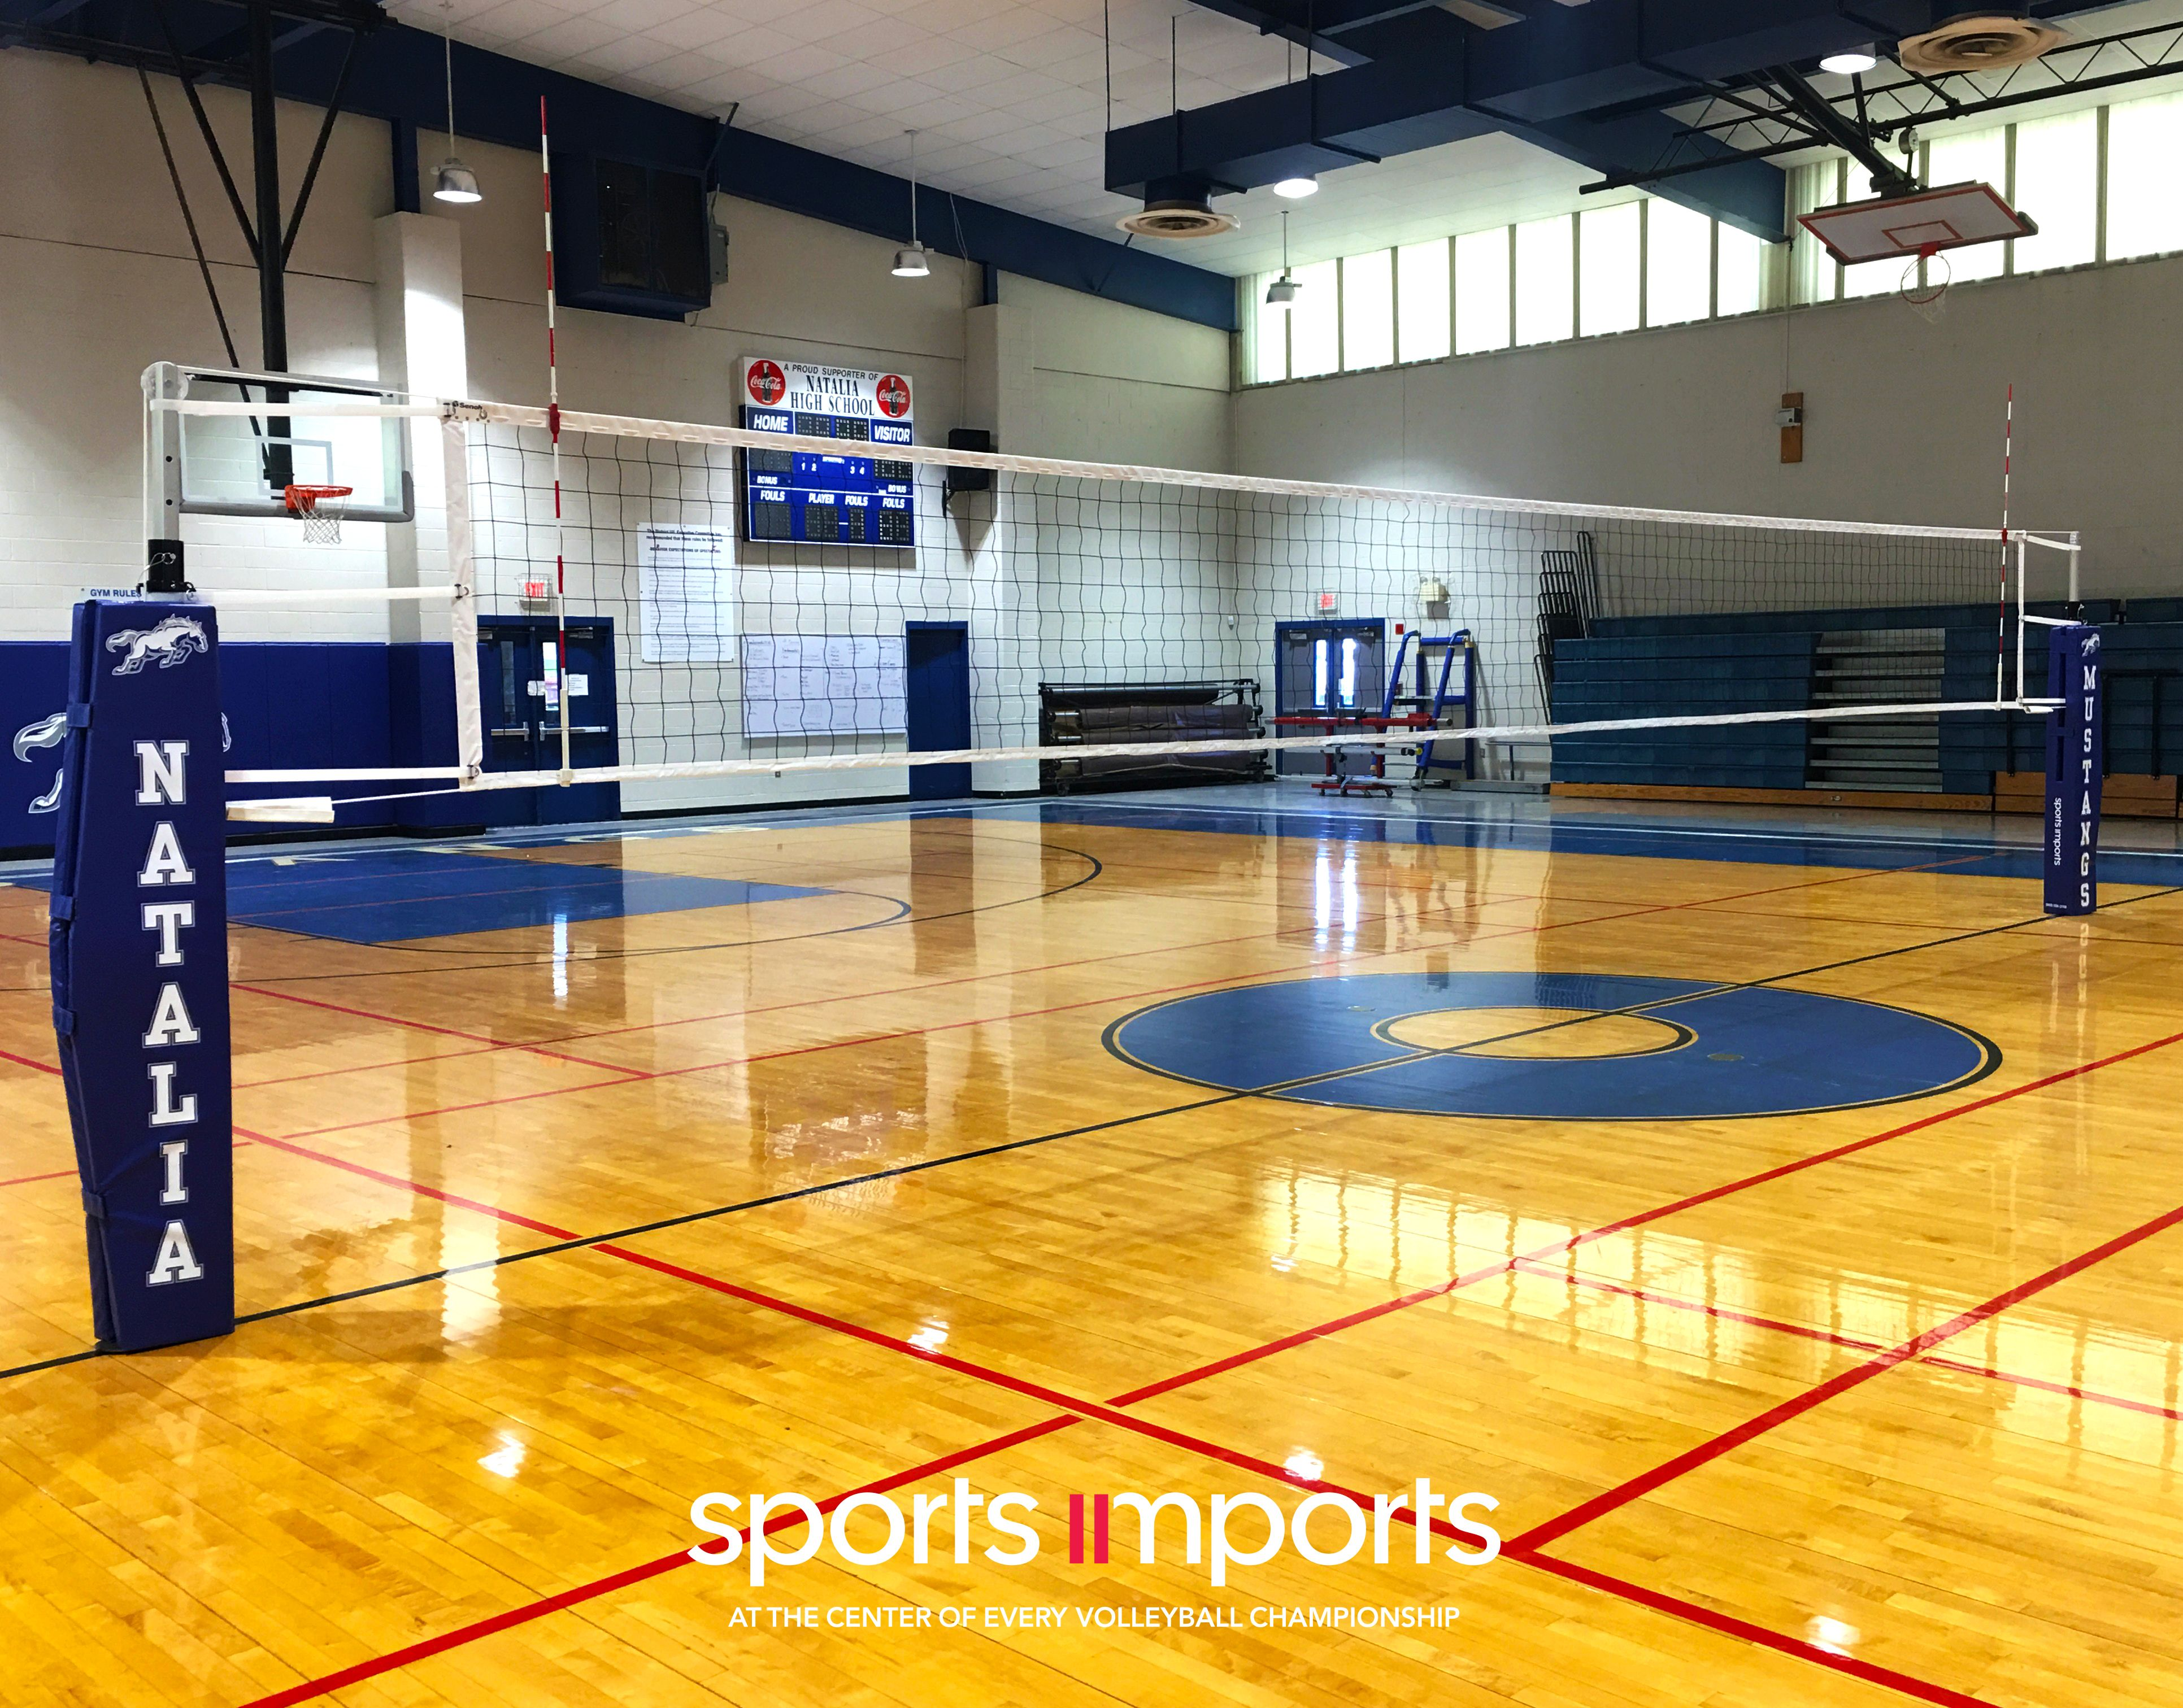 Natalia High School In Texas Indoor Basketball Court Volleyball Net Outdoor Volleyball Net